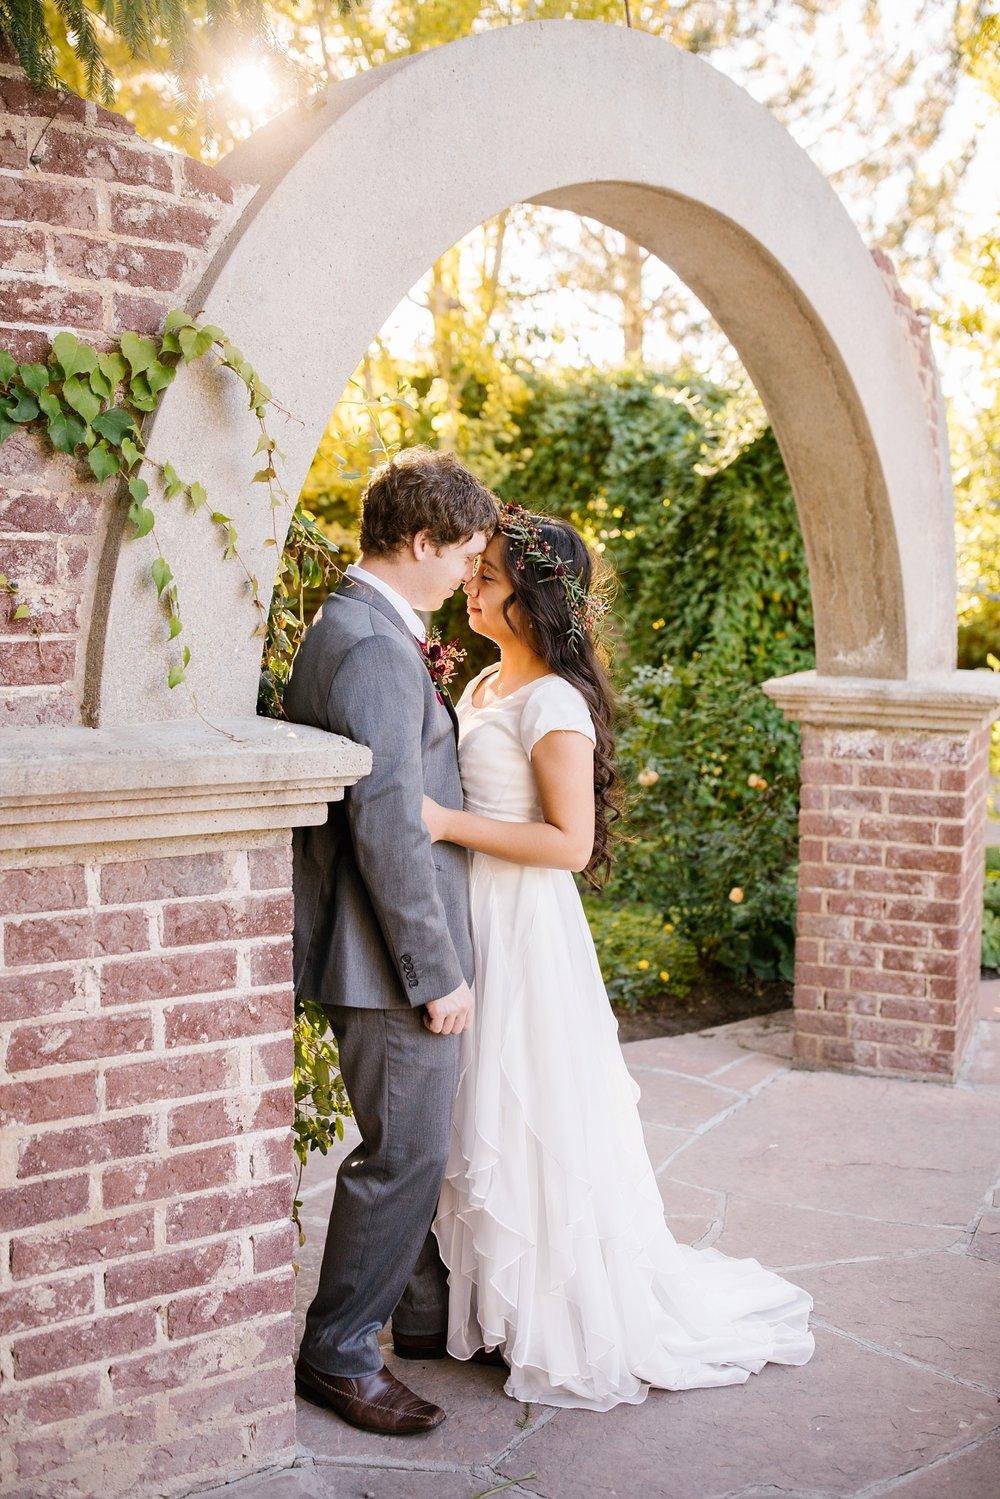 JB-Bridals-1_Lizzie-B-Imagery-Utah-Wedding-Photographer-Thanksgiving-Point-Ashton-Gardens-Lehi-Utah.jpg